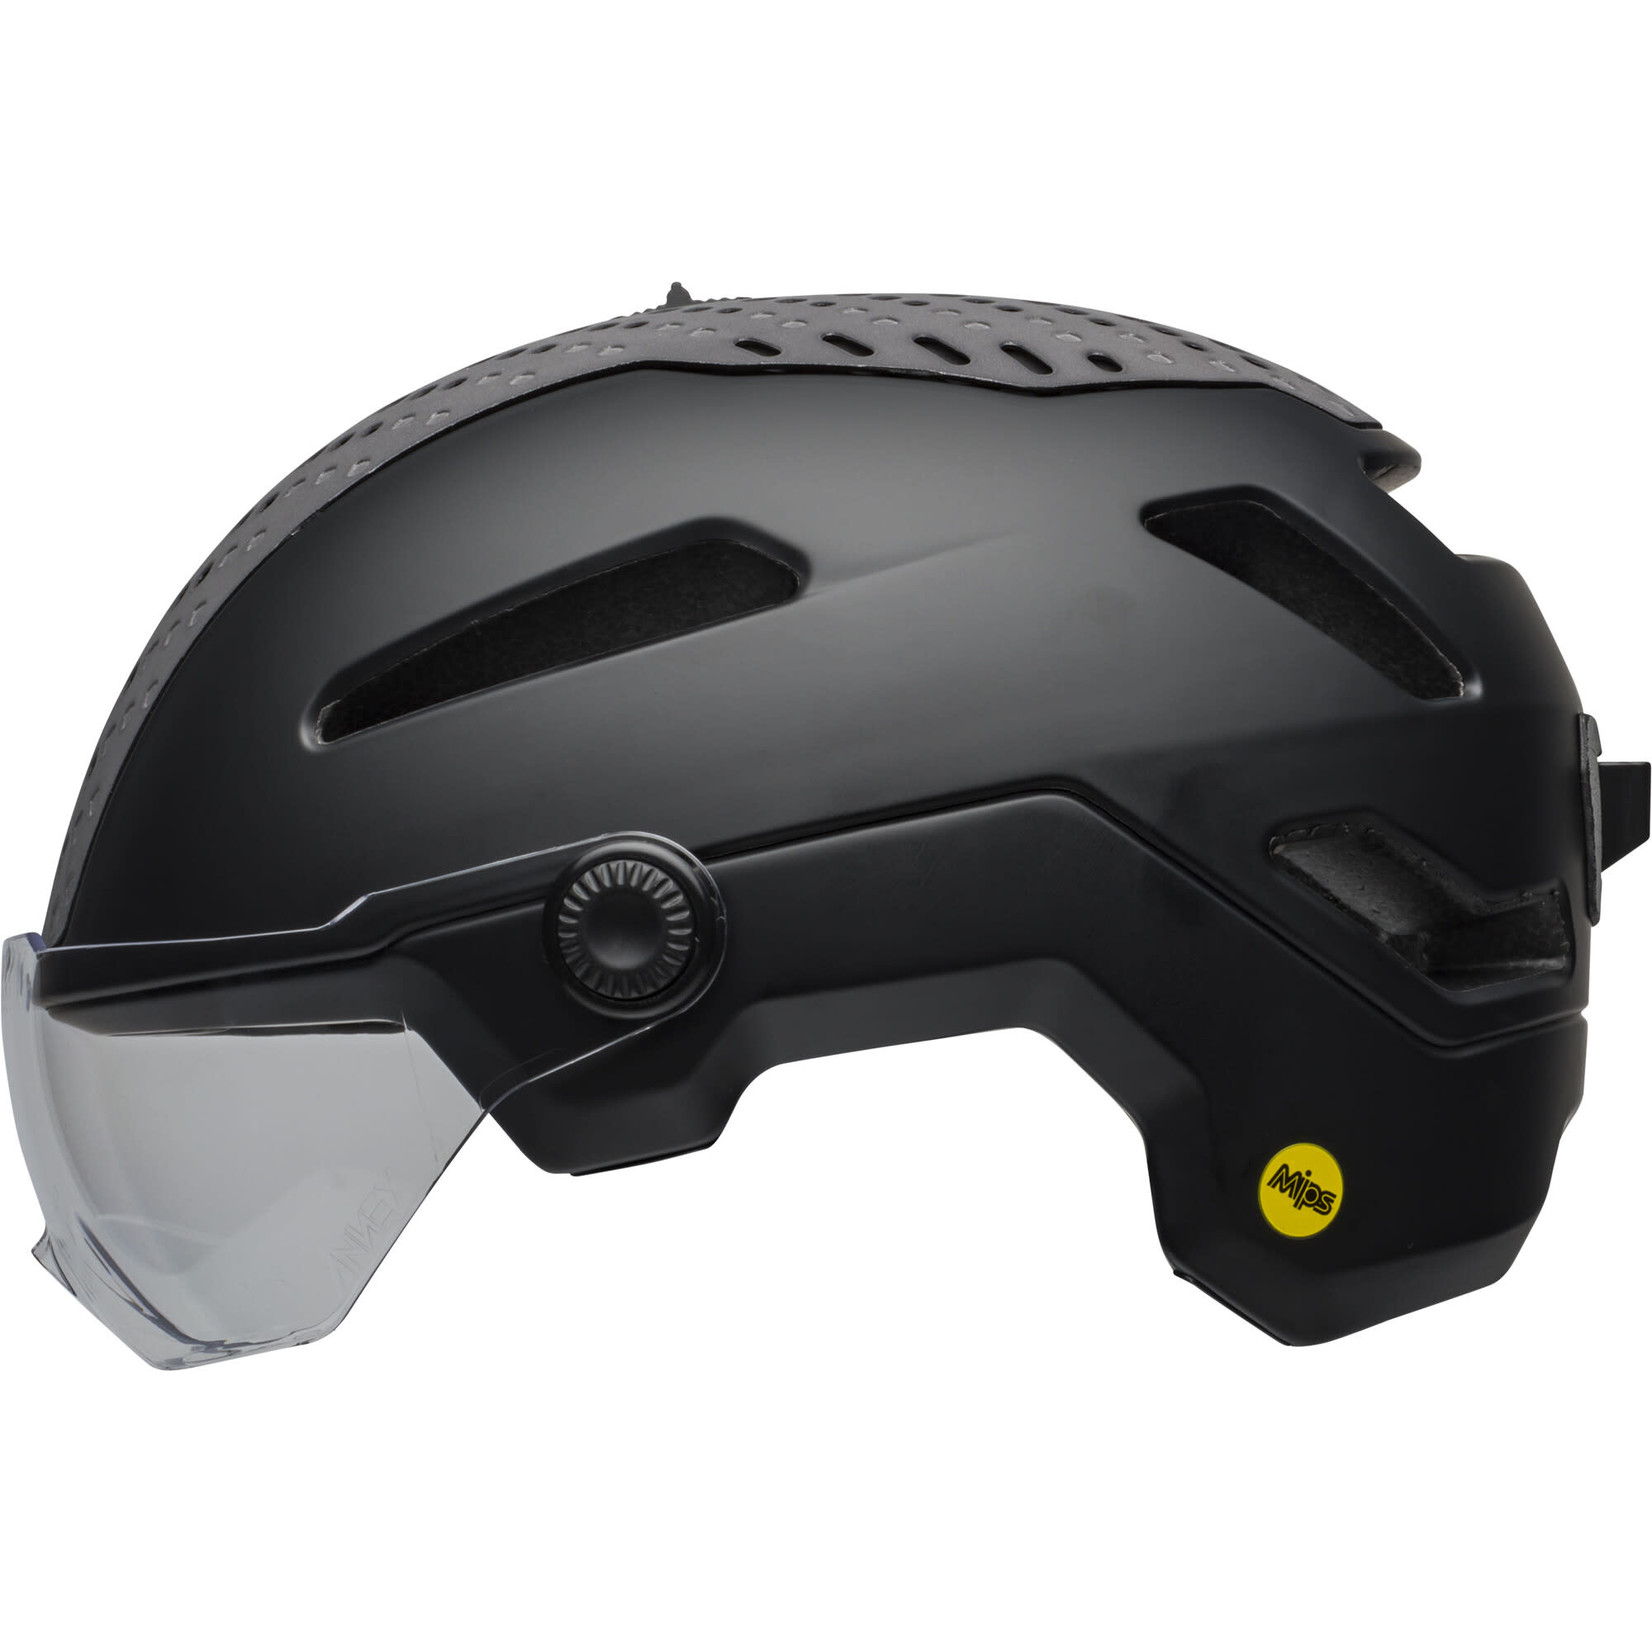 Bell Giro - Helme Annex shield MIPS - matt black